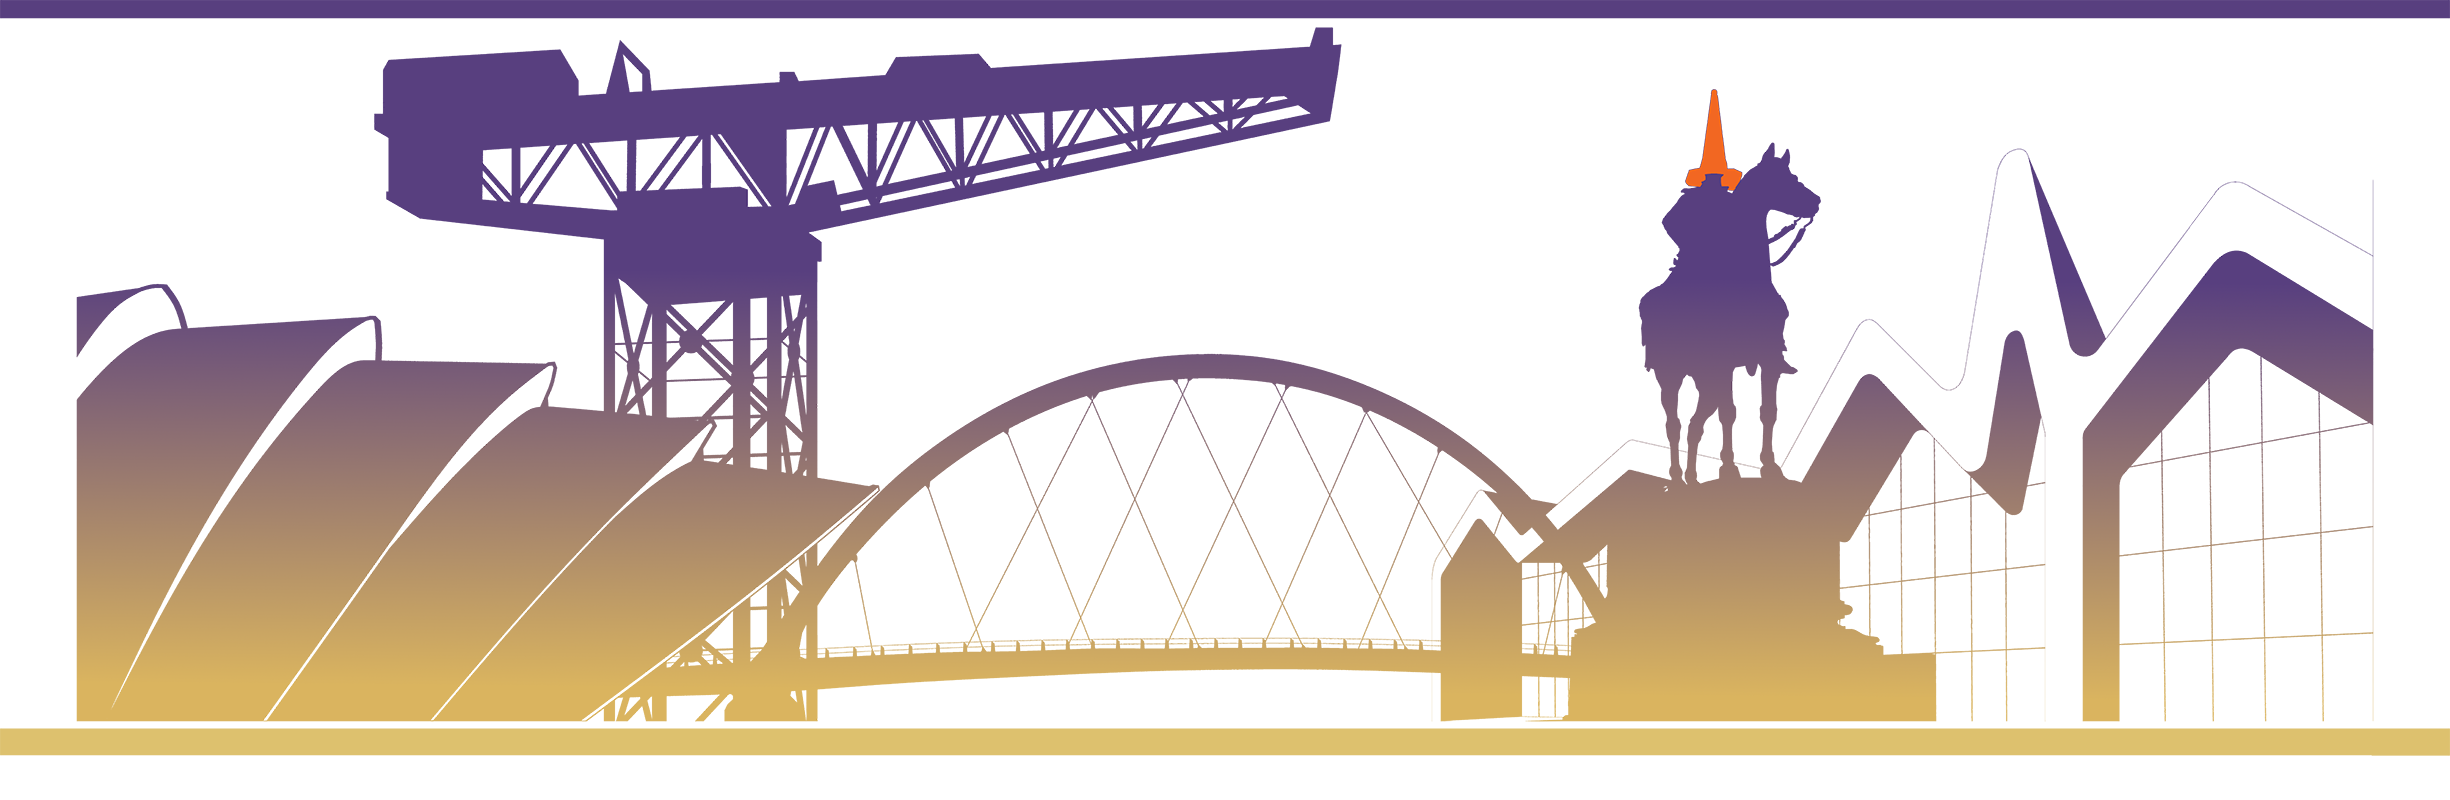 SVM Glasgow - Skyline Illustration